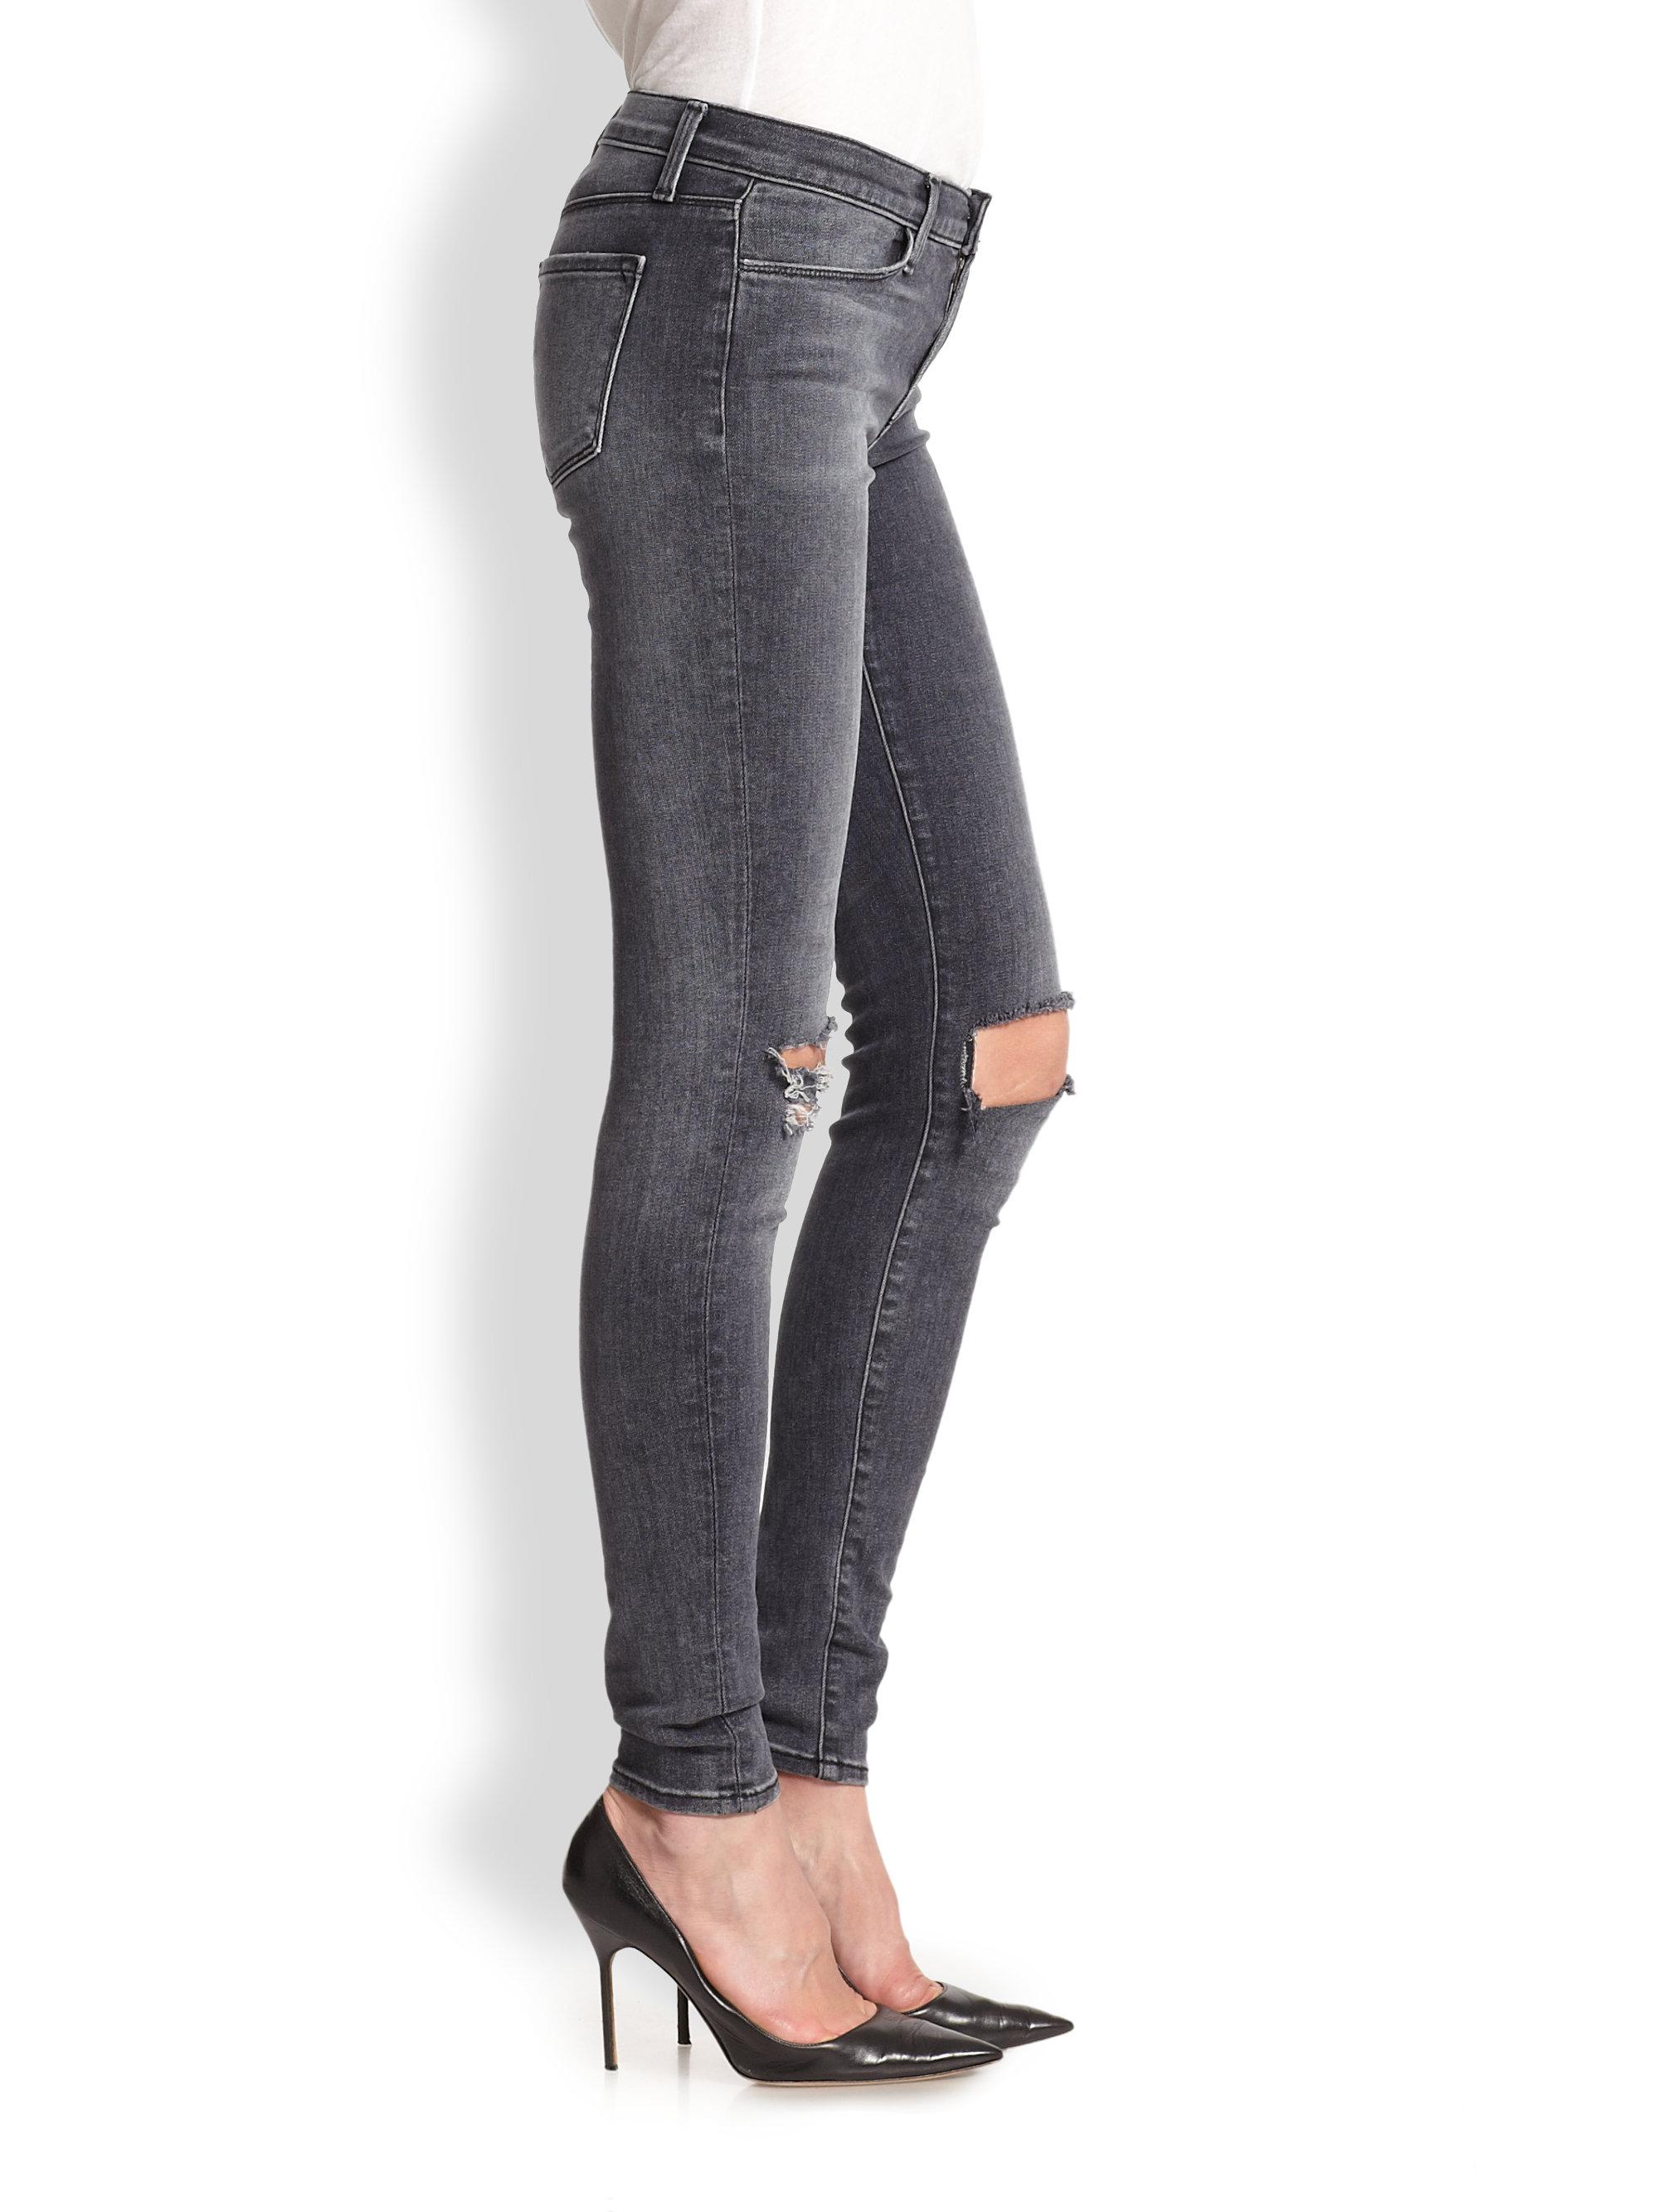 J brand 620 Distressed Skinny Jeans in Black | Lyst